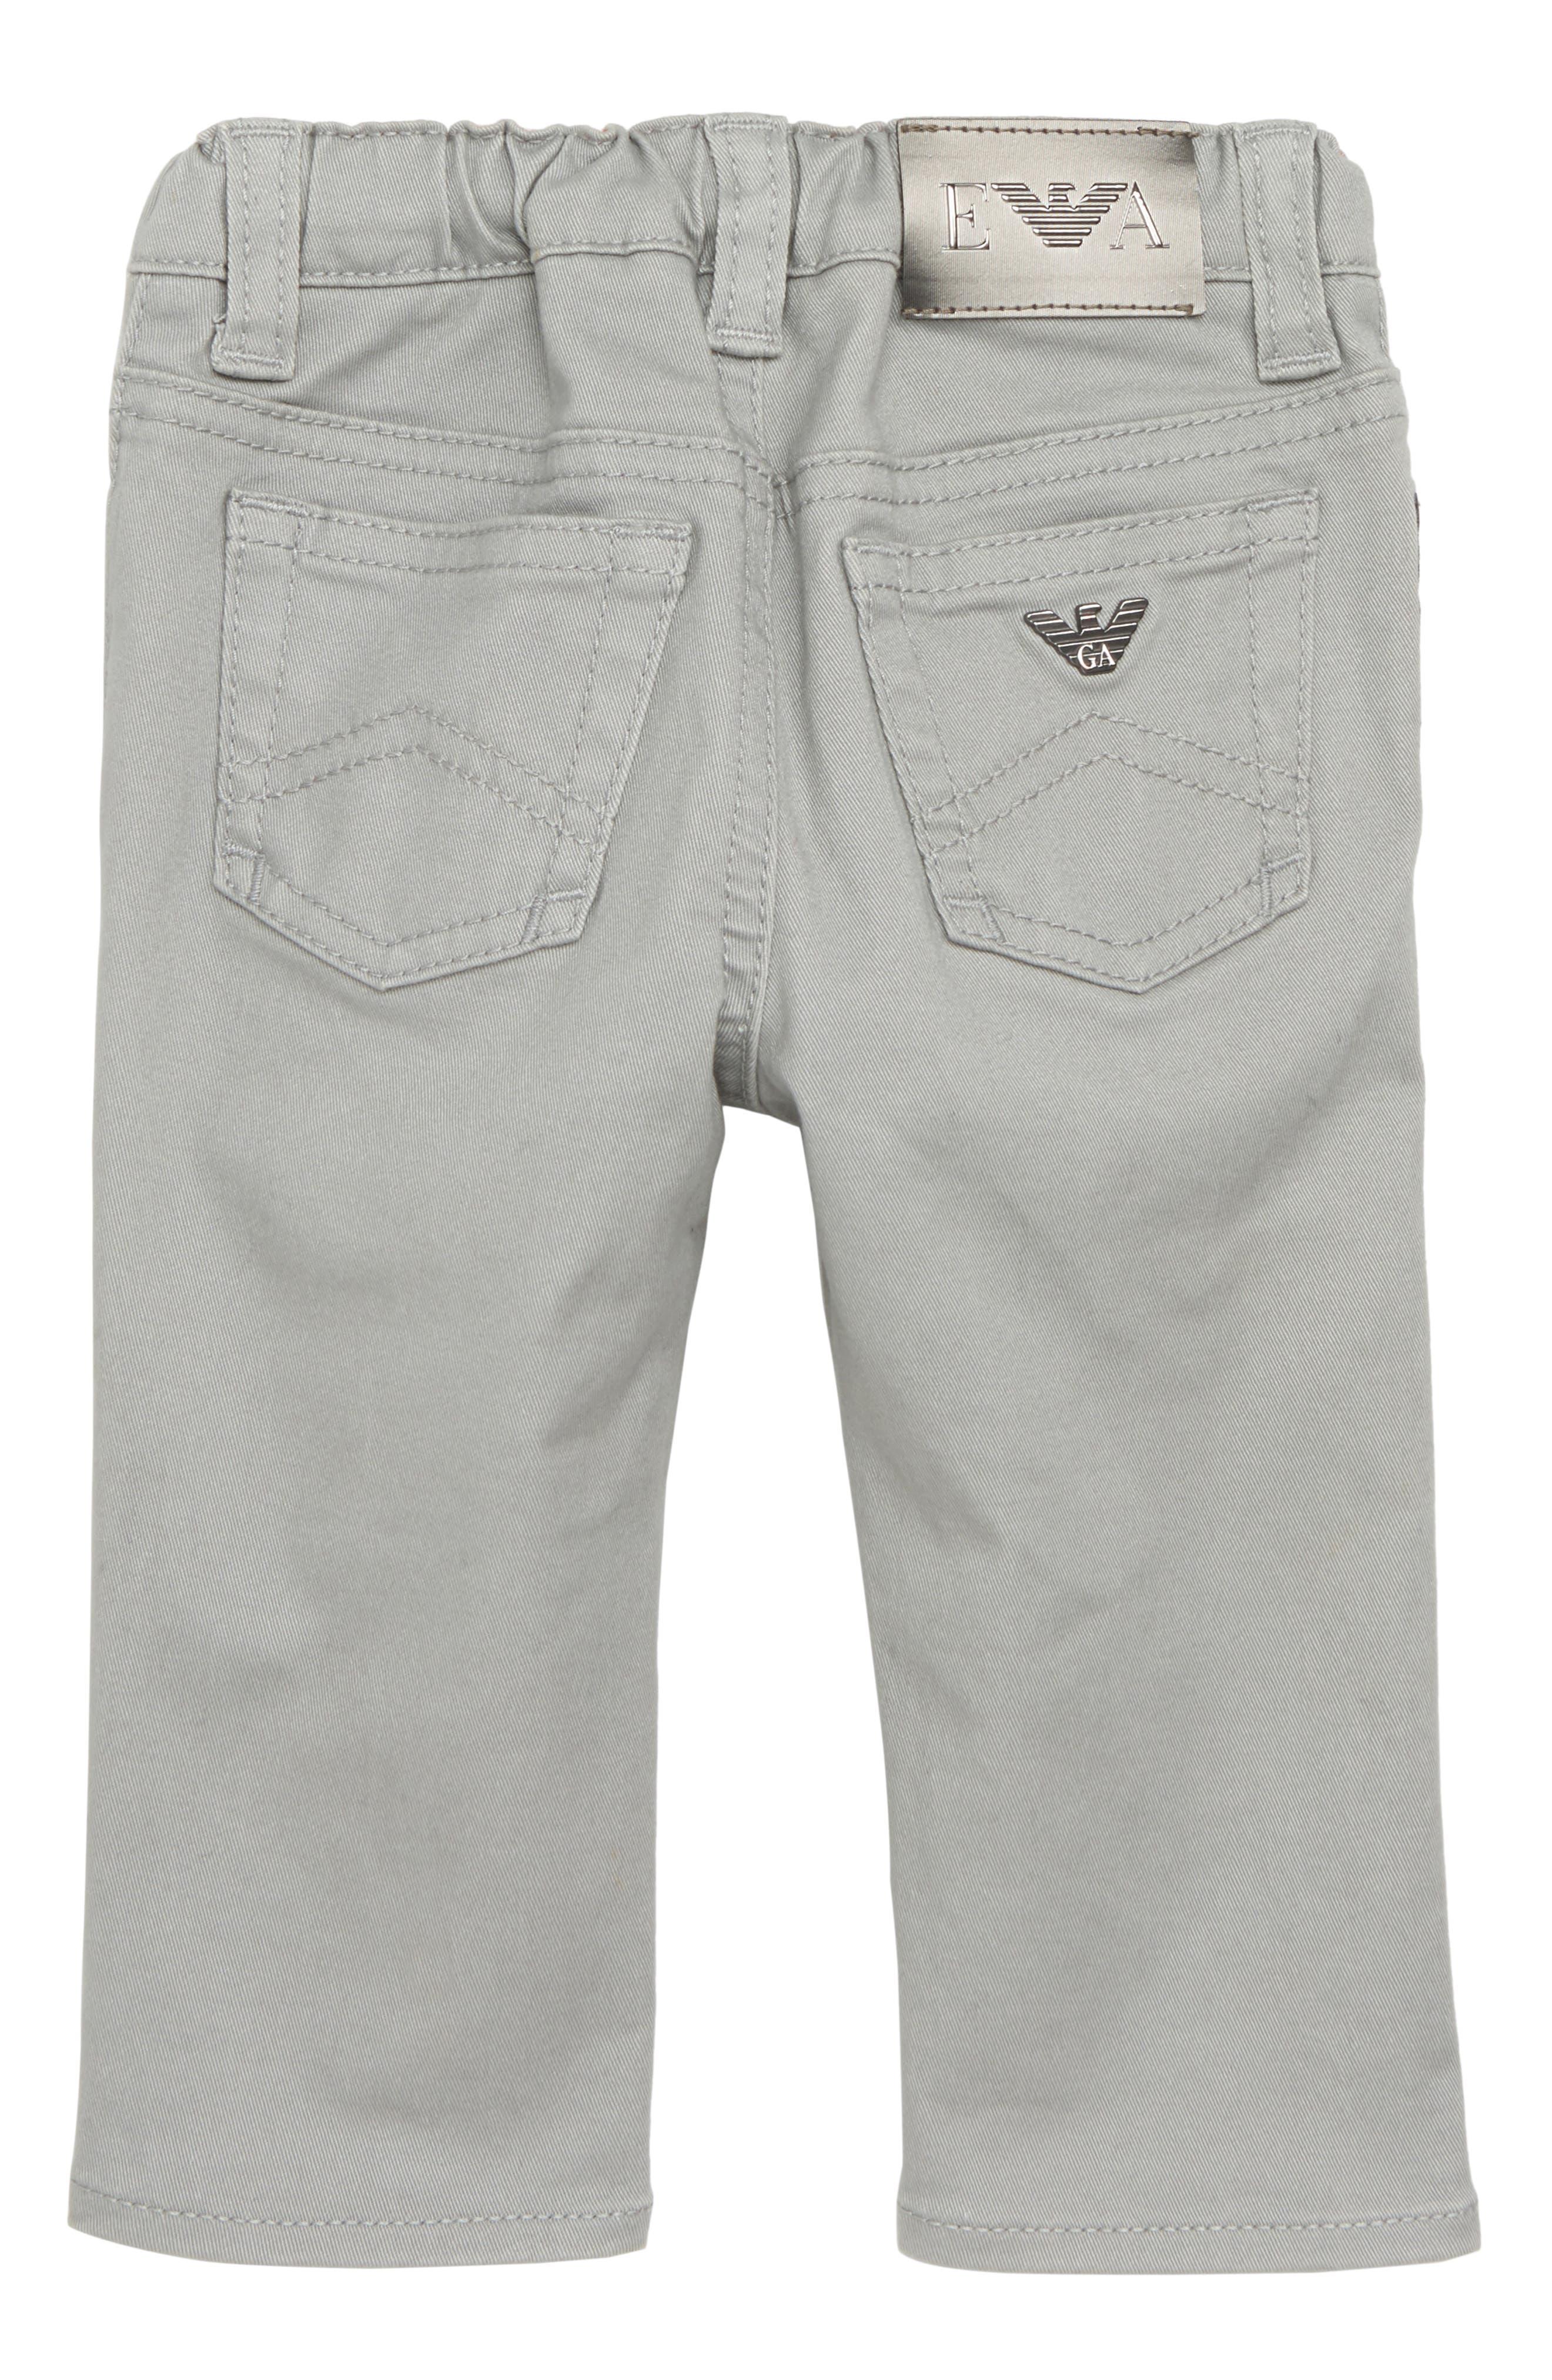 5-Pocket Jeans,                             Alternate thumbnail 2, color,                             SILVER